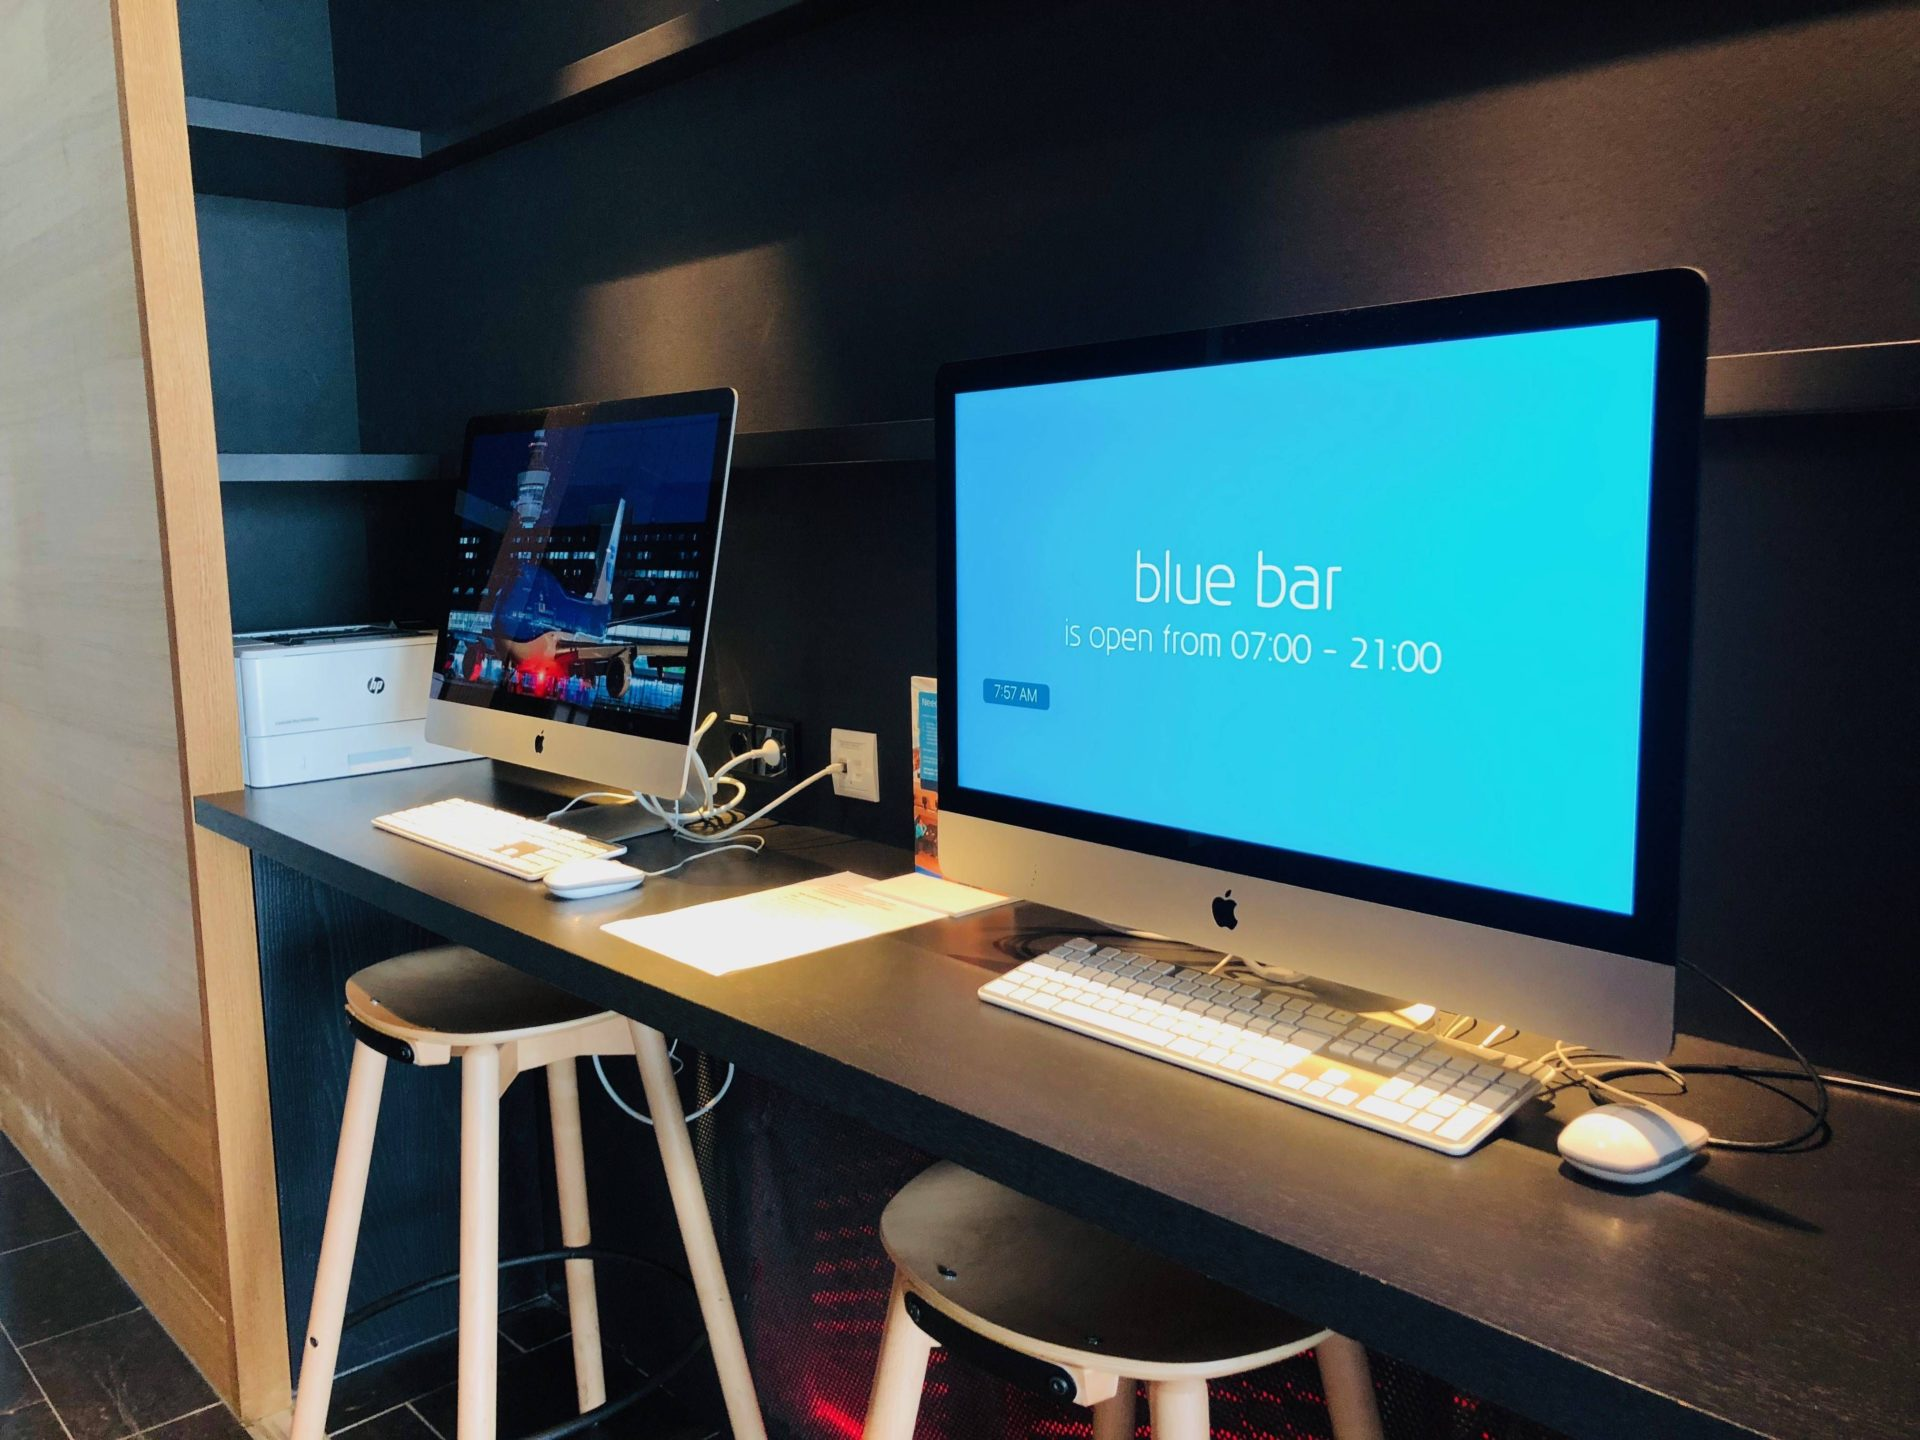 KLM Crown Lounge iMacs